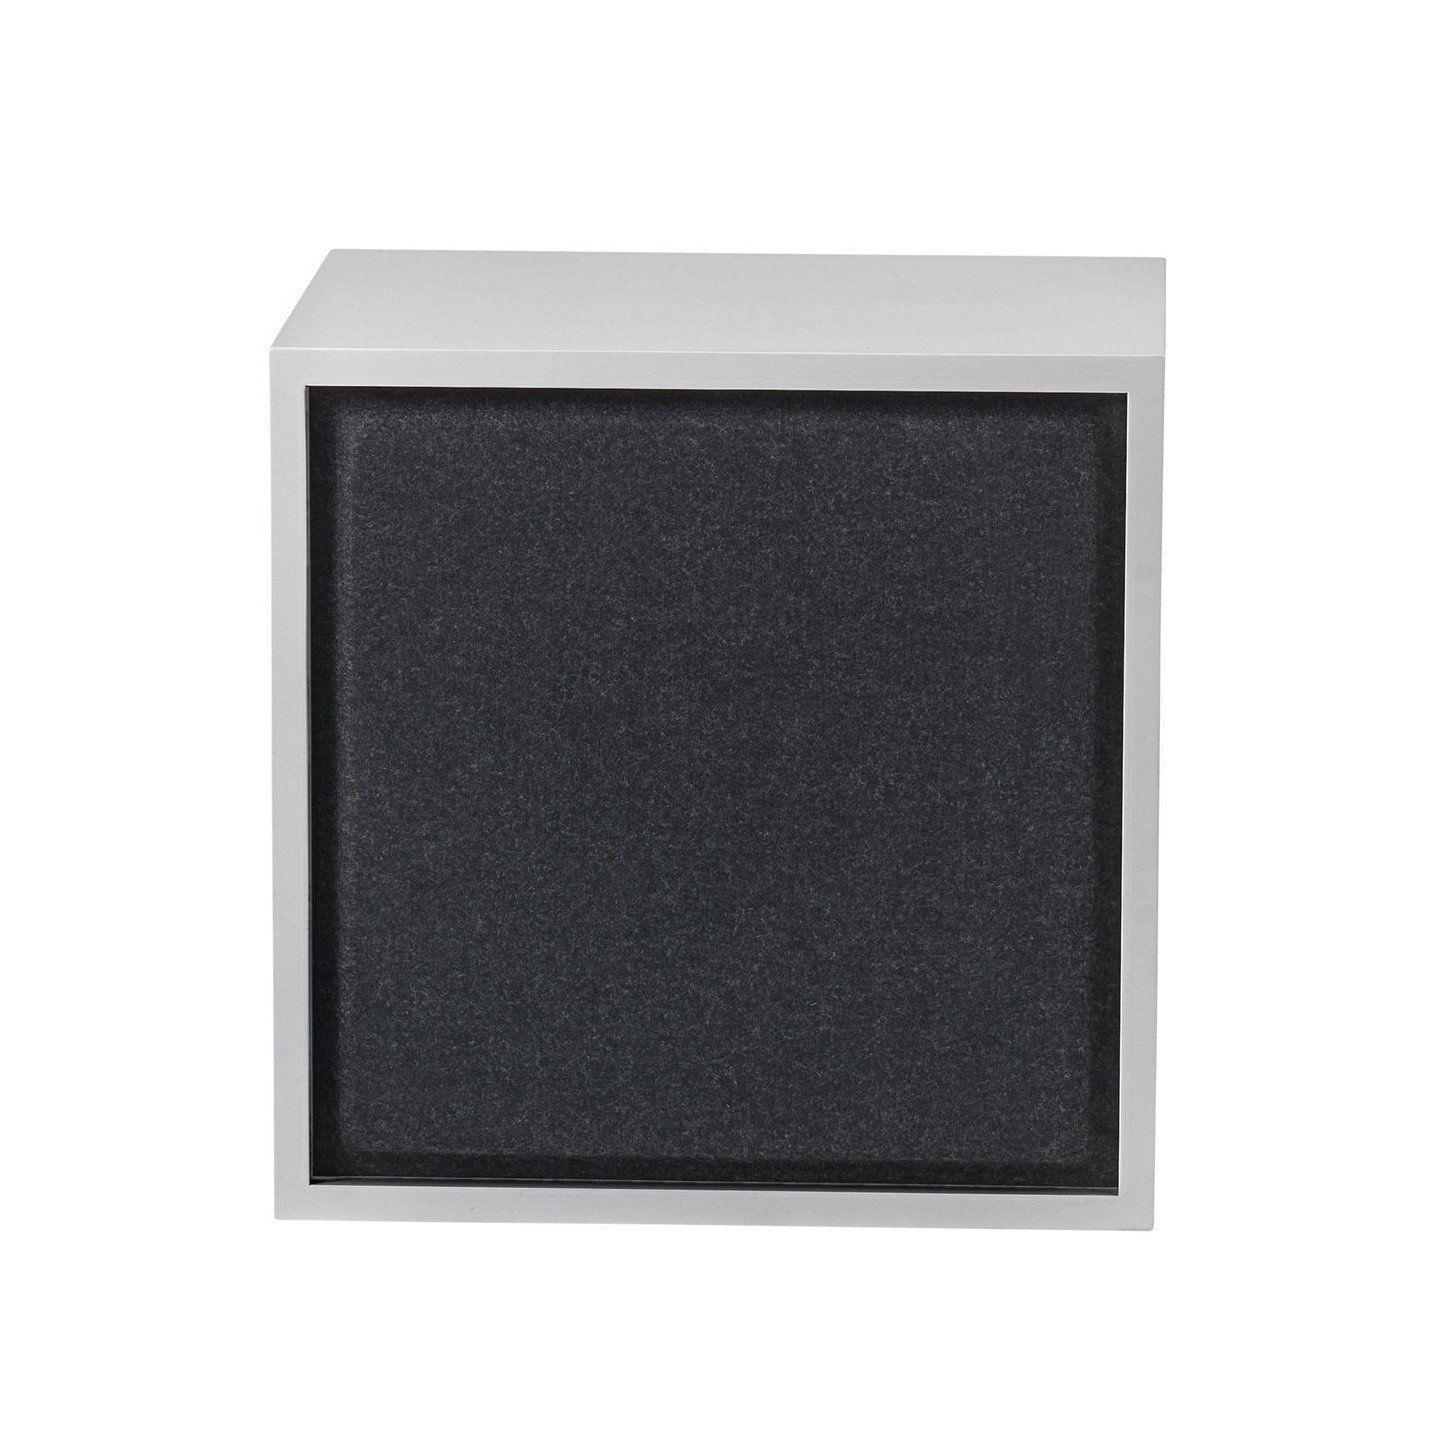 Muuto  Muuto Stacked Acoustic Panel M  Blackfabric Black